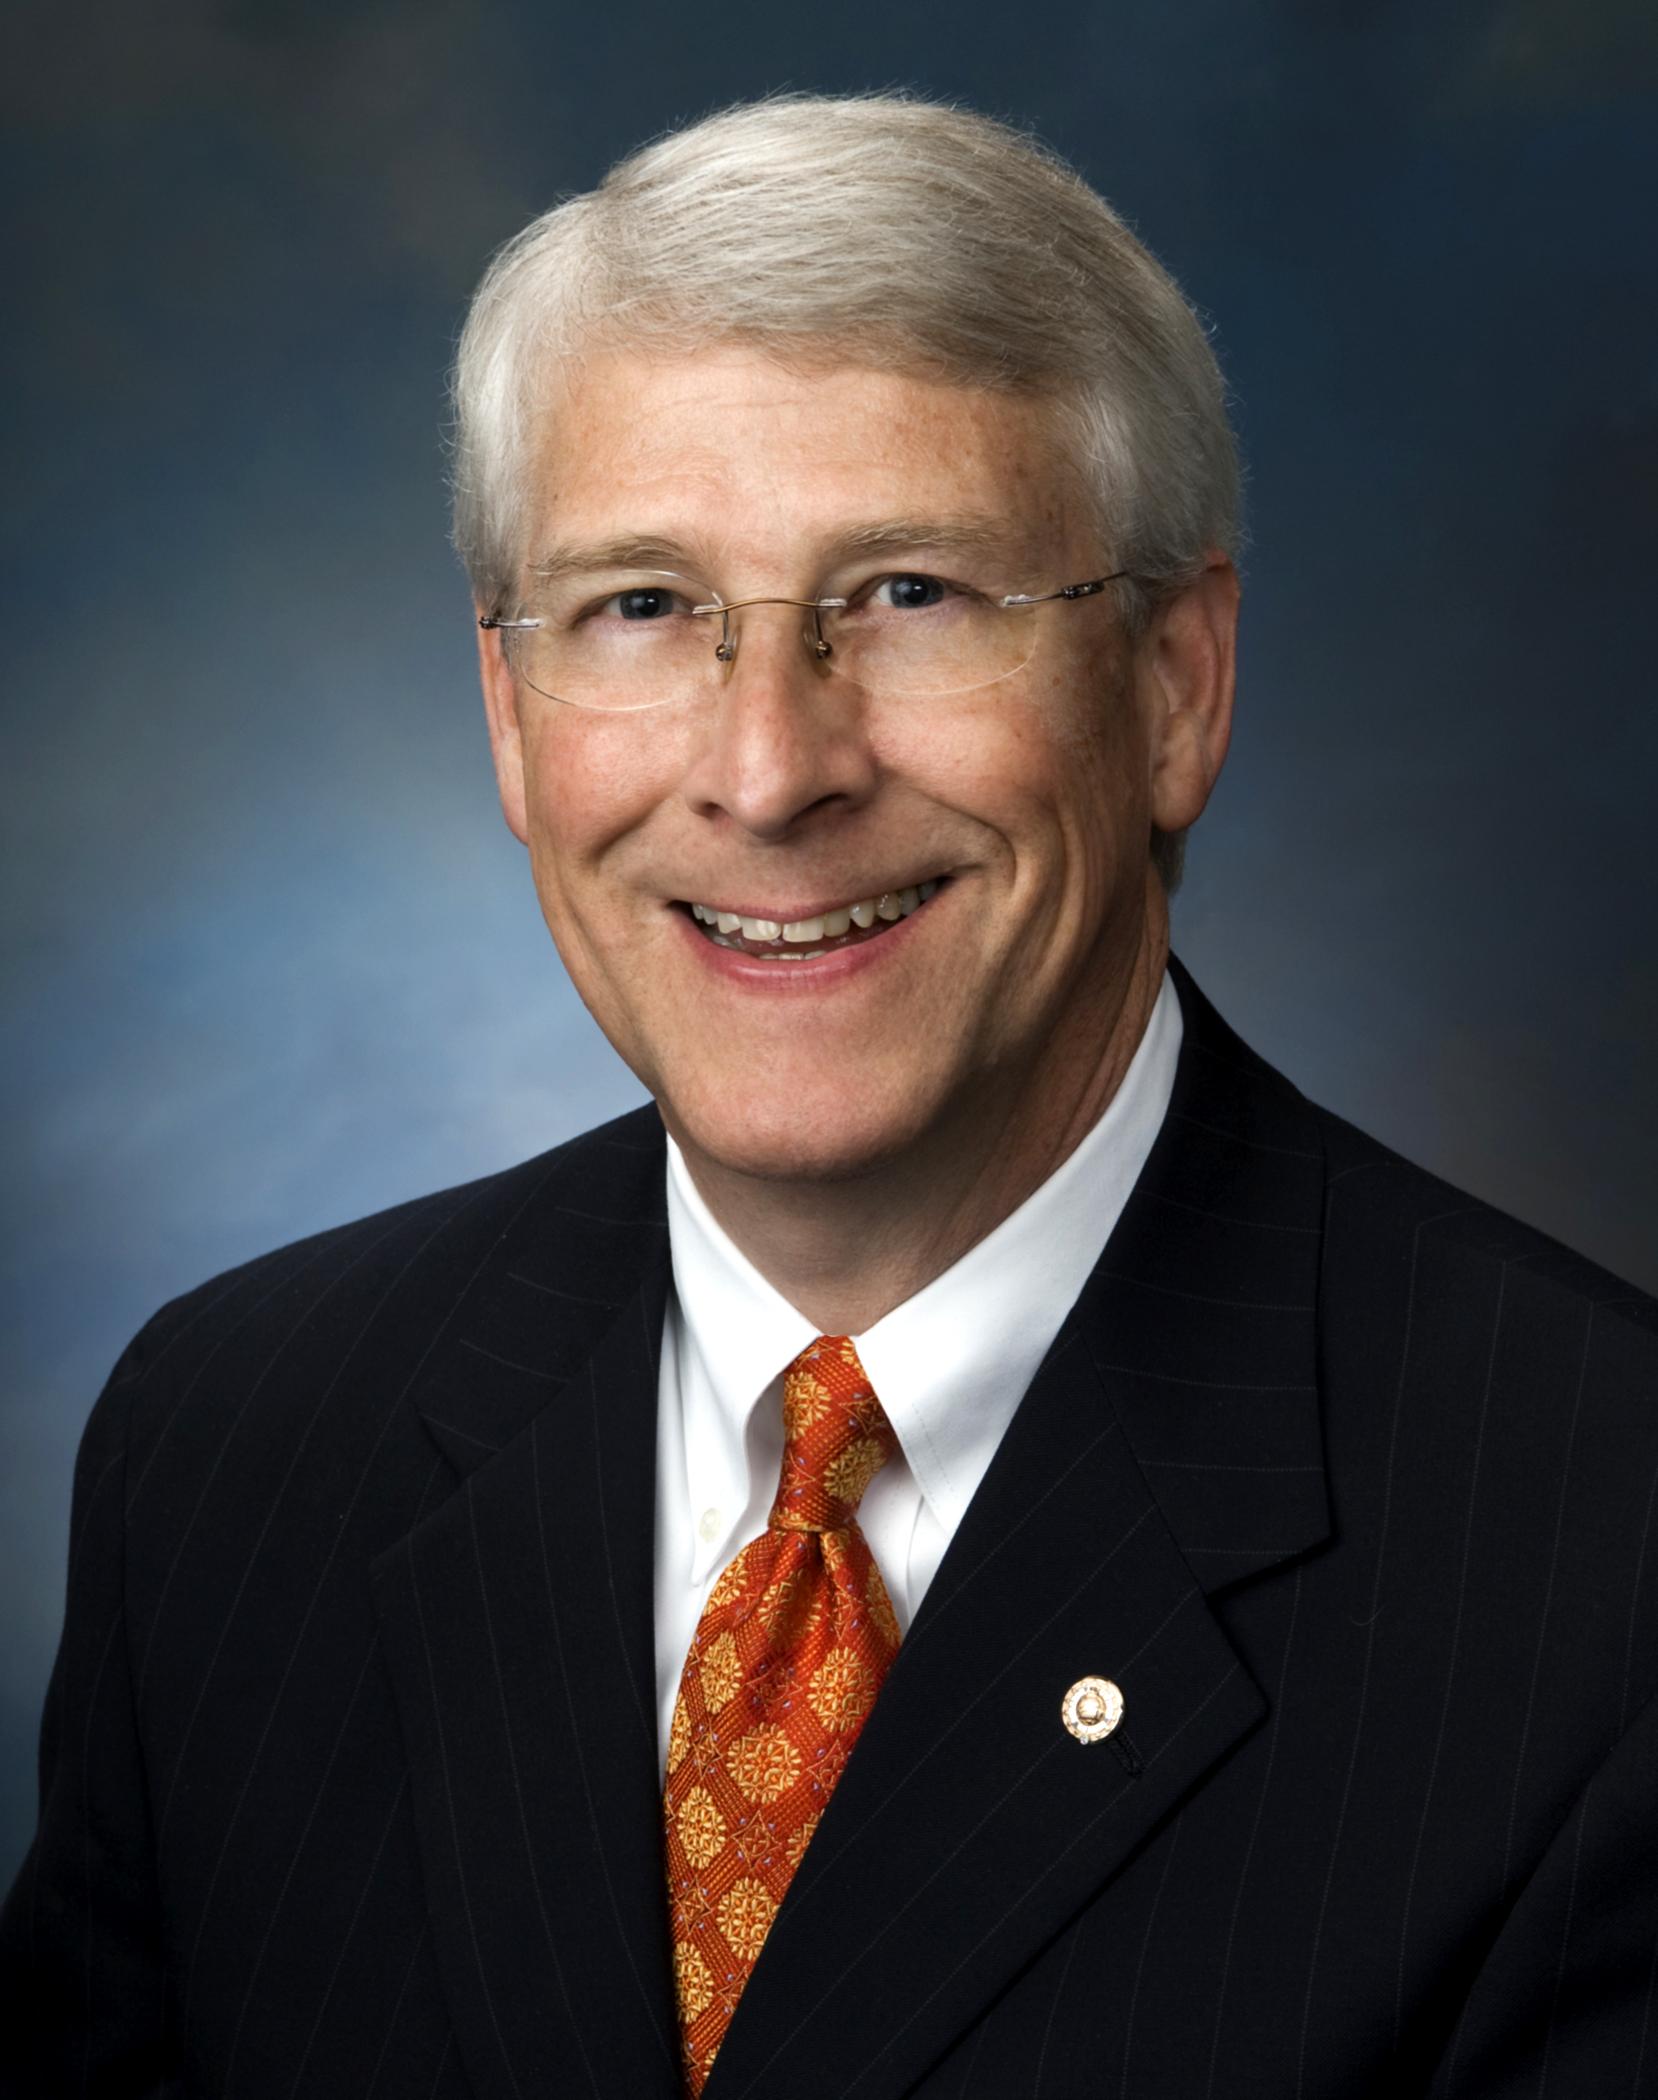 Senator Roger Wicker - R